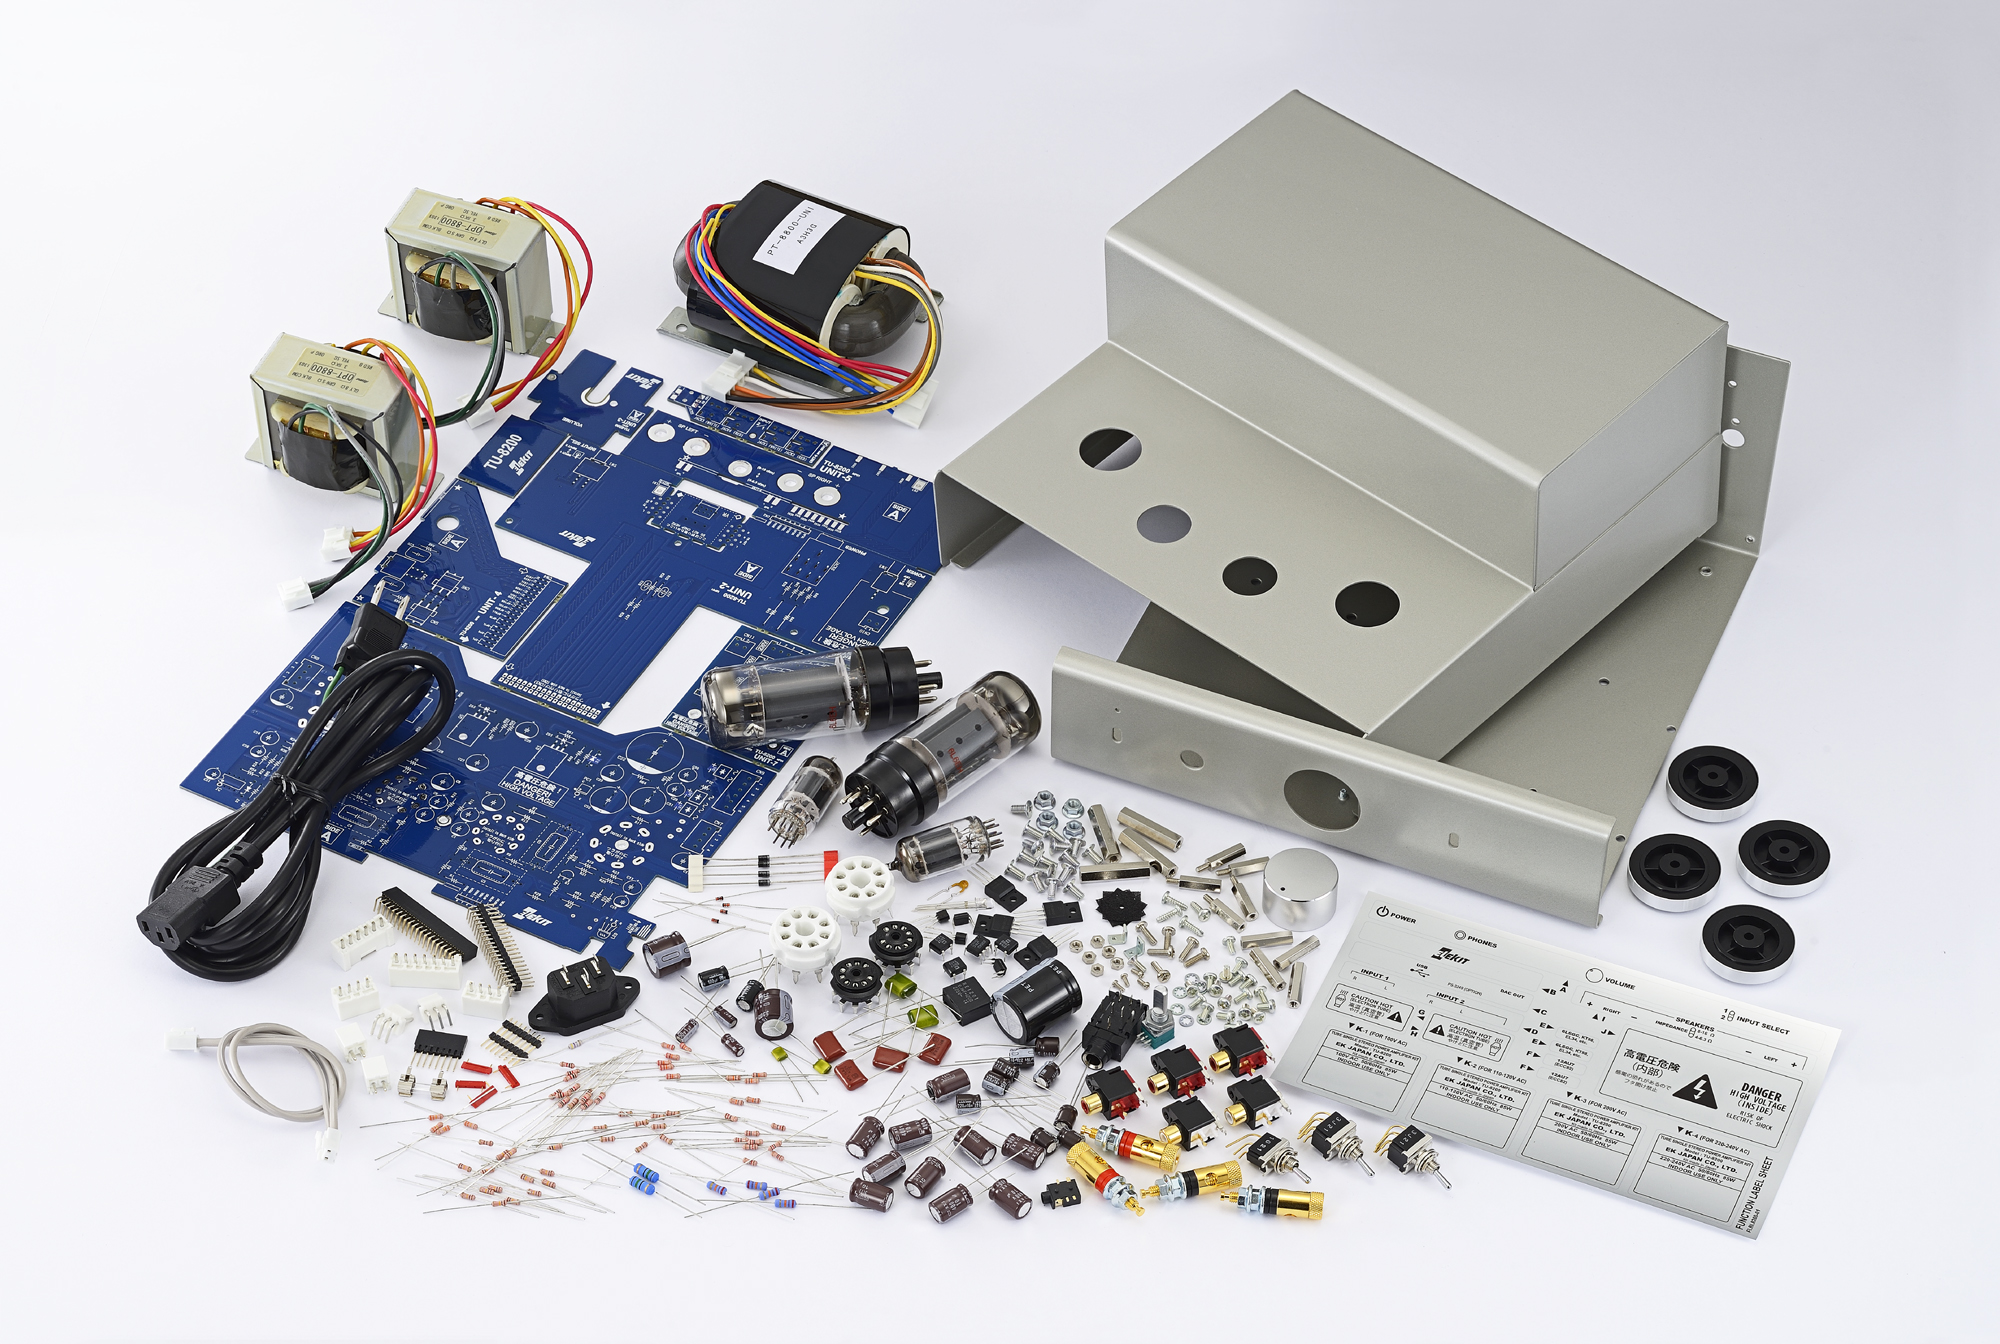 Elekit TU-8200-DX integrated amplifier/headphone amplifier kit